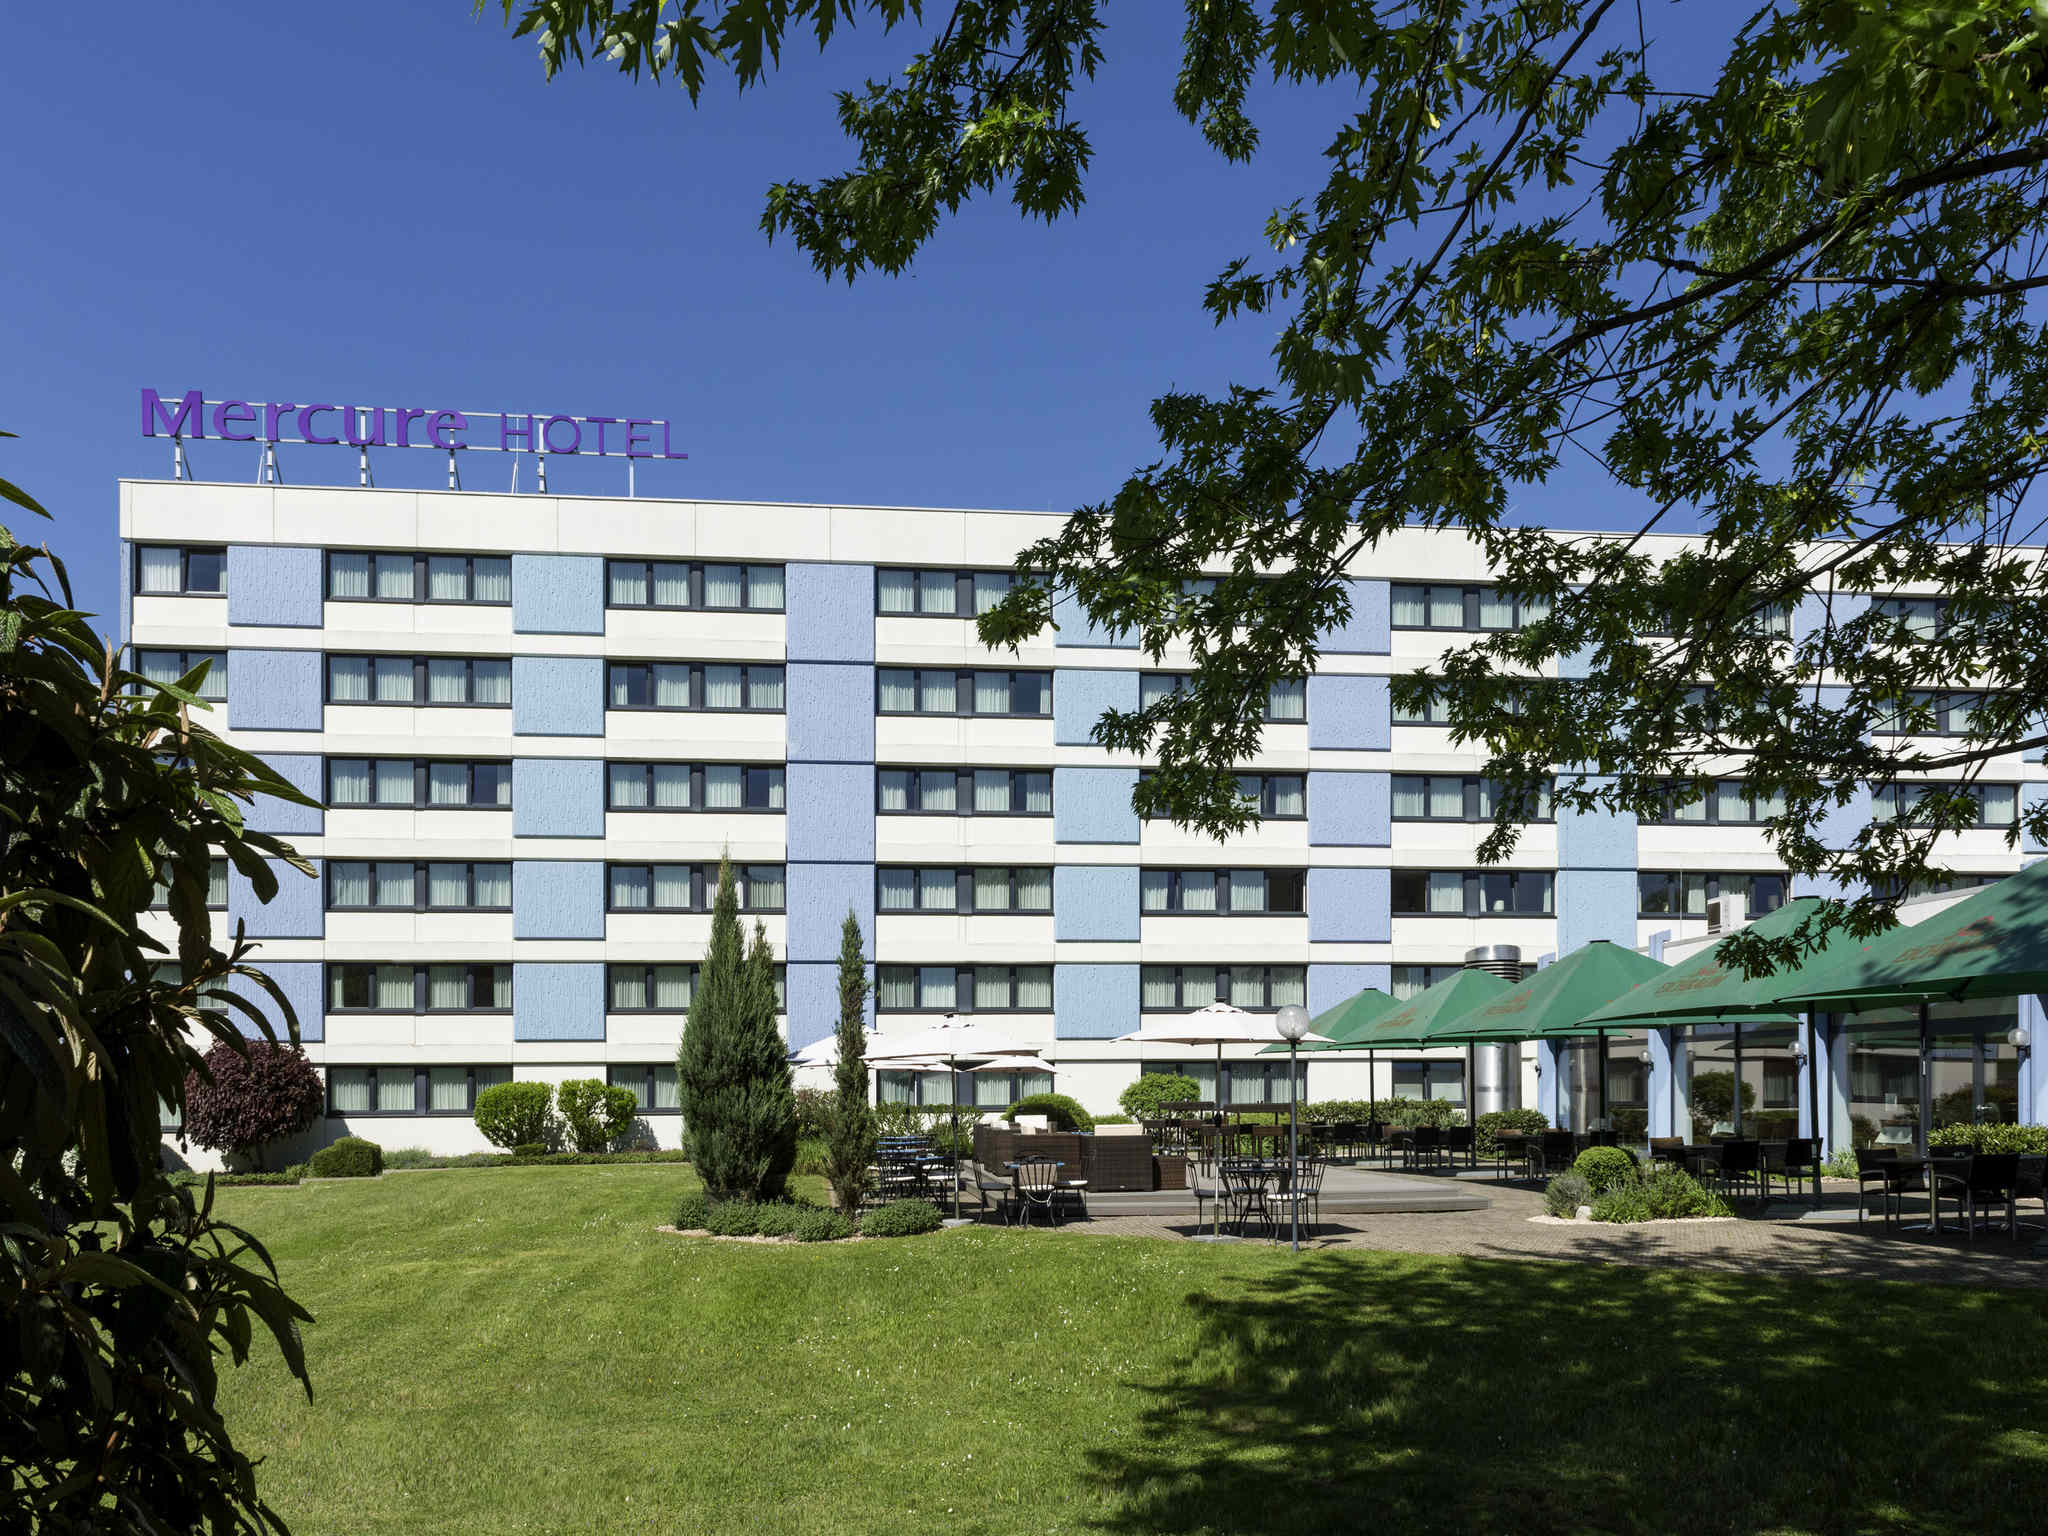 Hotel - Mercure Hotel Mannheim Am Friedensplatz